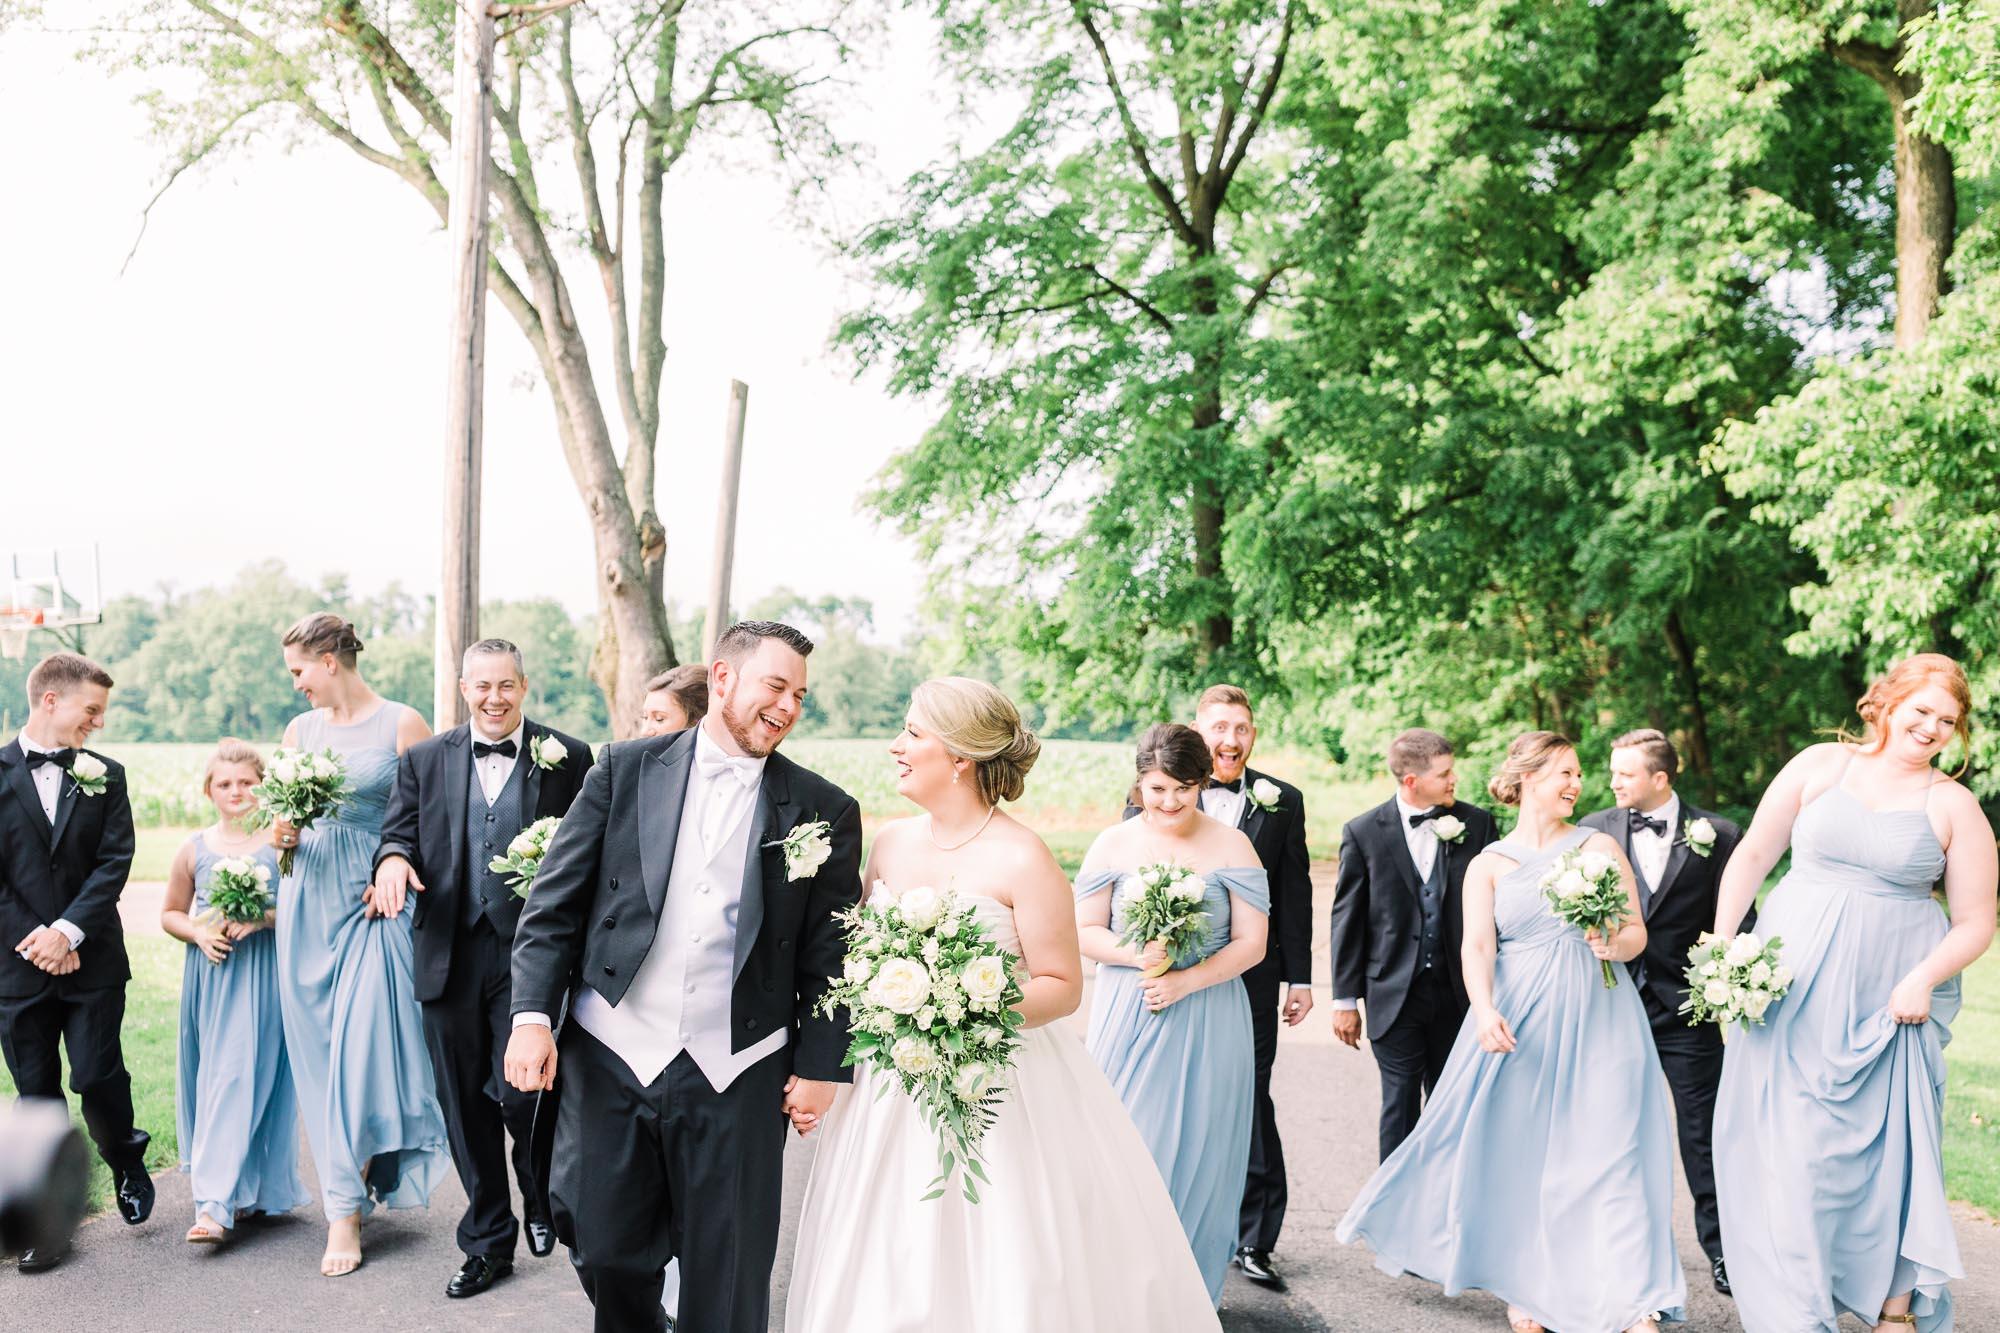 isle-of-que-wedding-6846.jpg